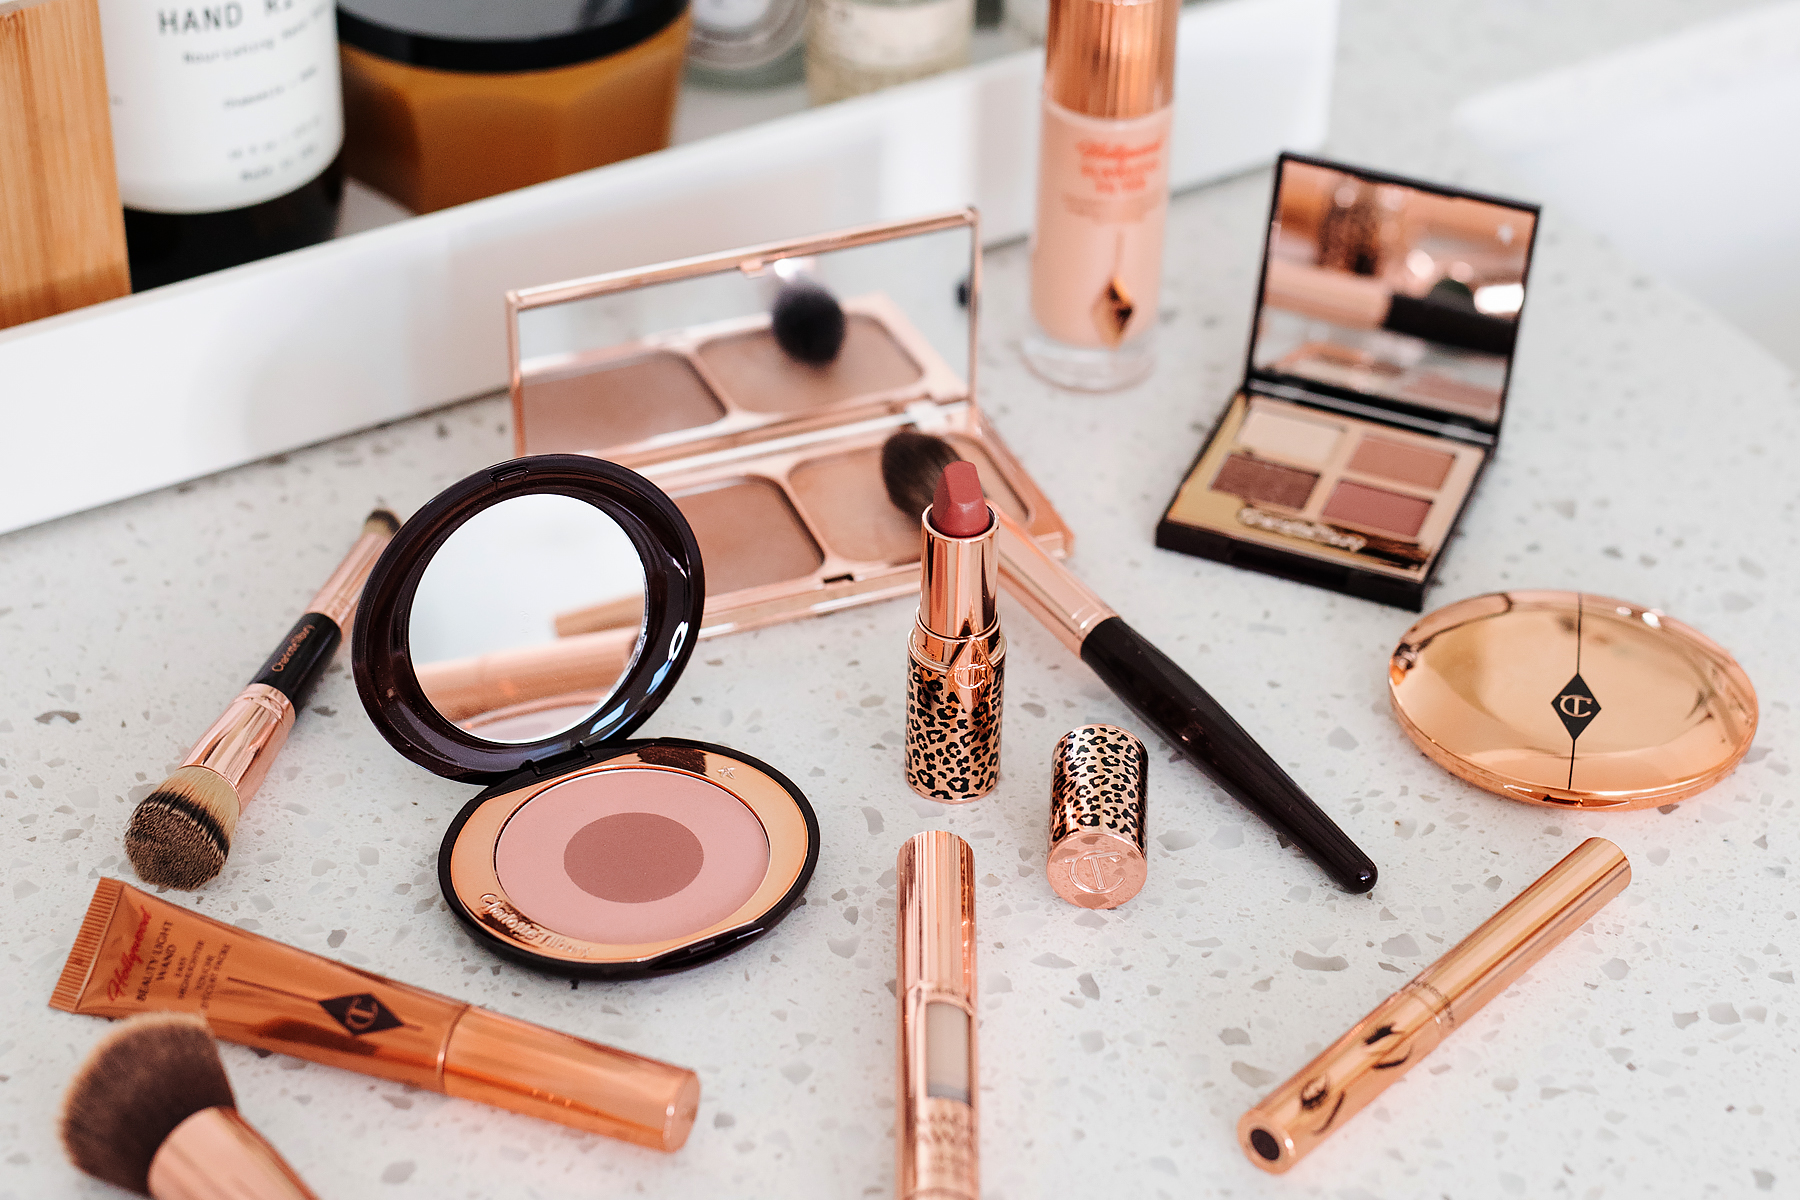 Charlotte Tilbury Sephora Makeup